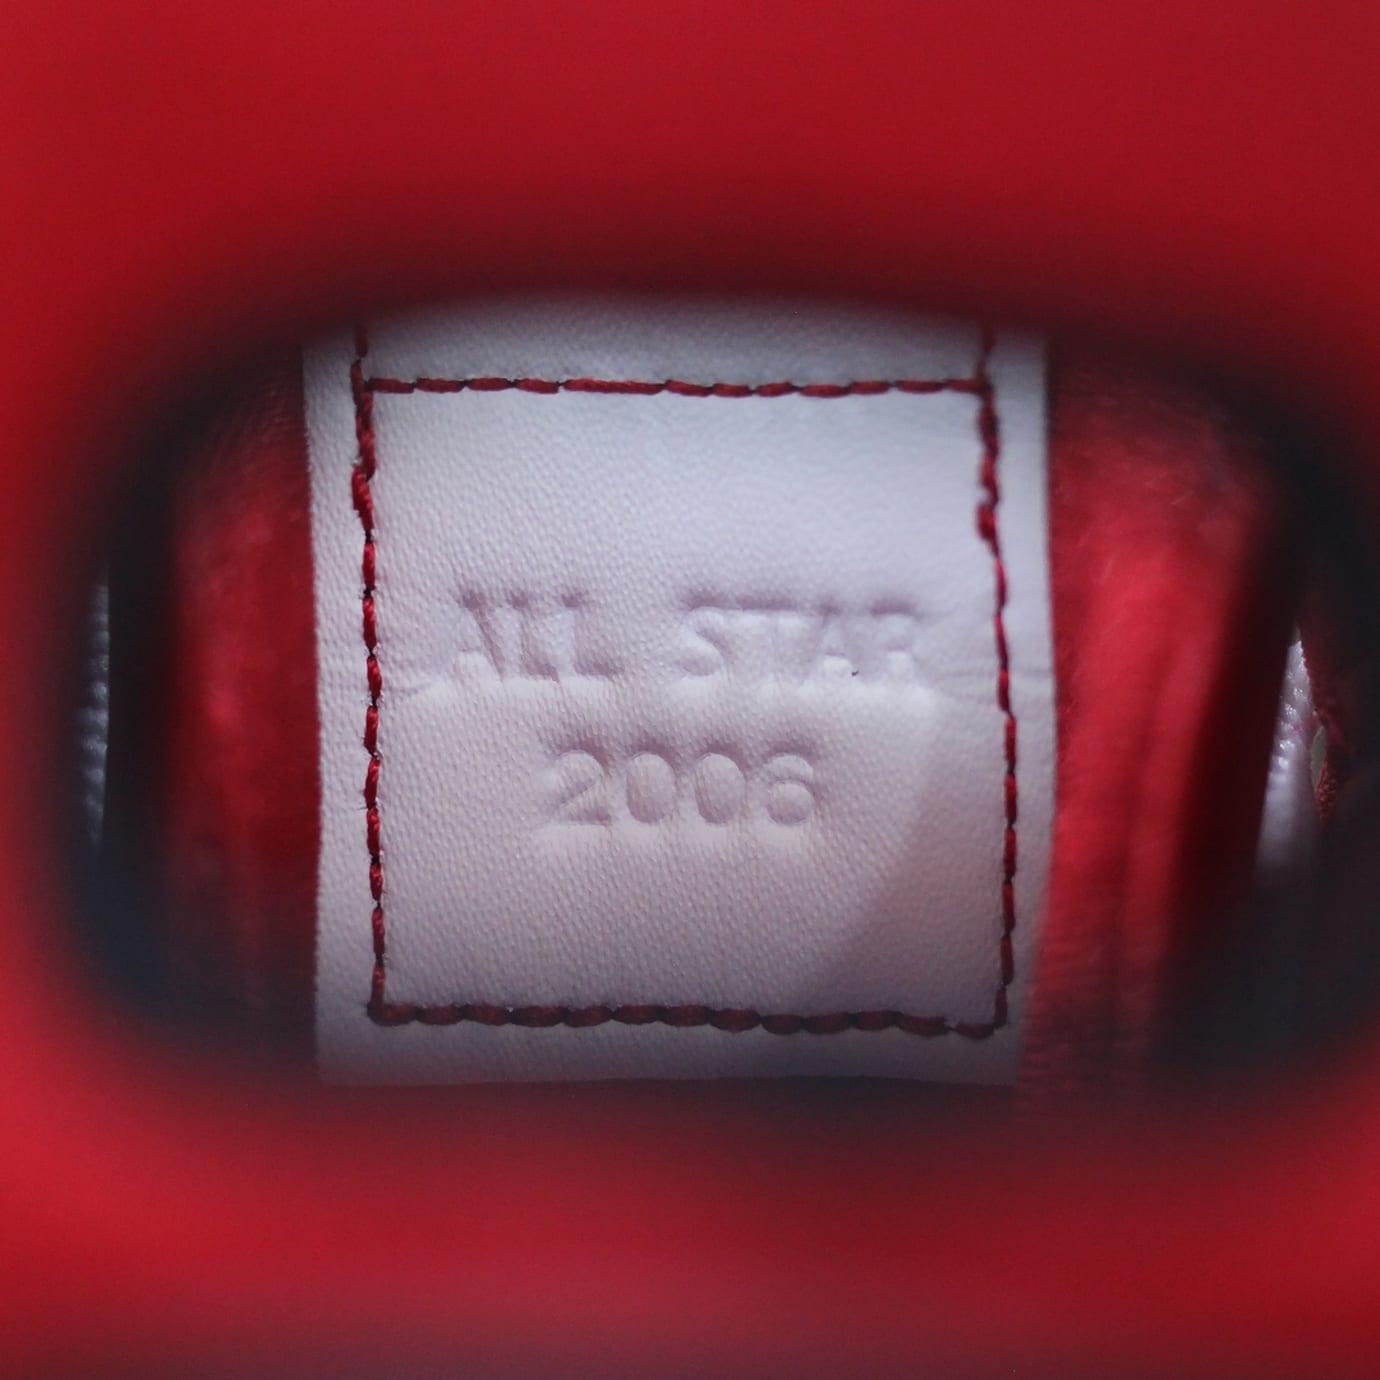 Nike Zoom Kobe 1 Protro All-Star Release Date AQ2728-102 Black Tongue Tab